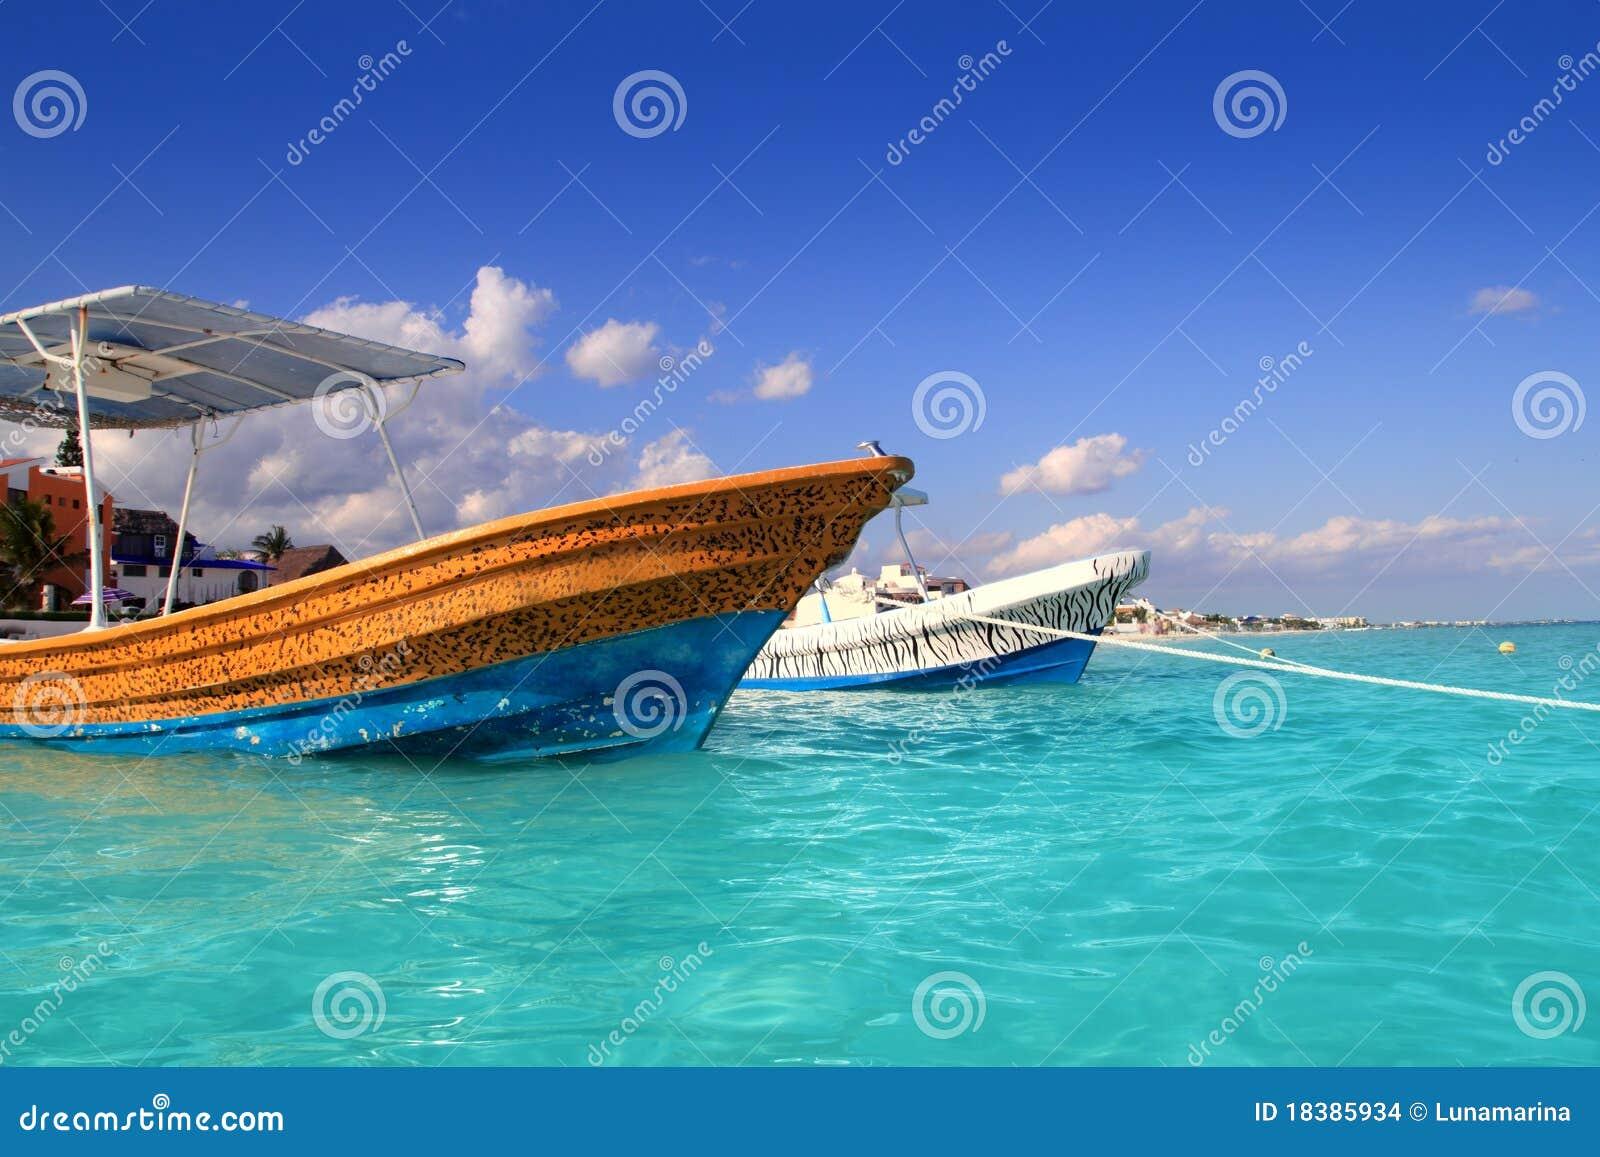 бирюза puerto morelos шлюпок пляжа карибская